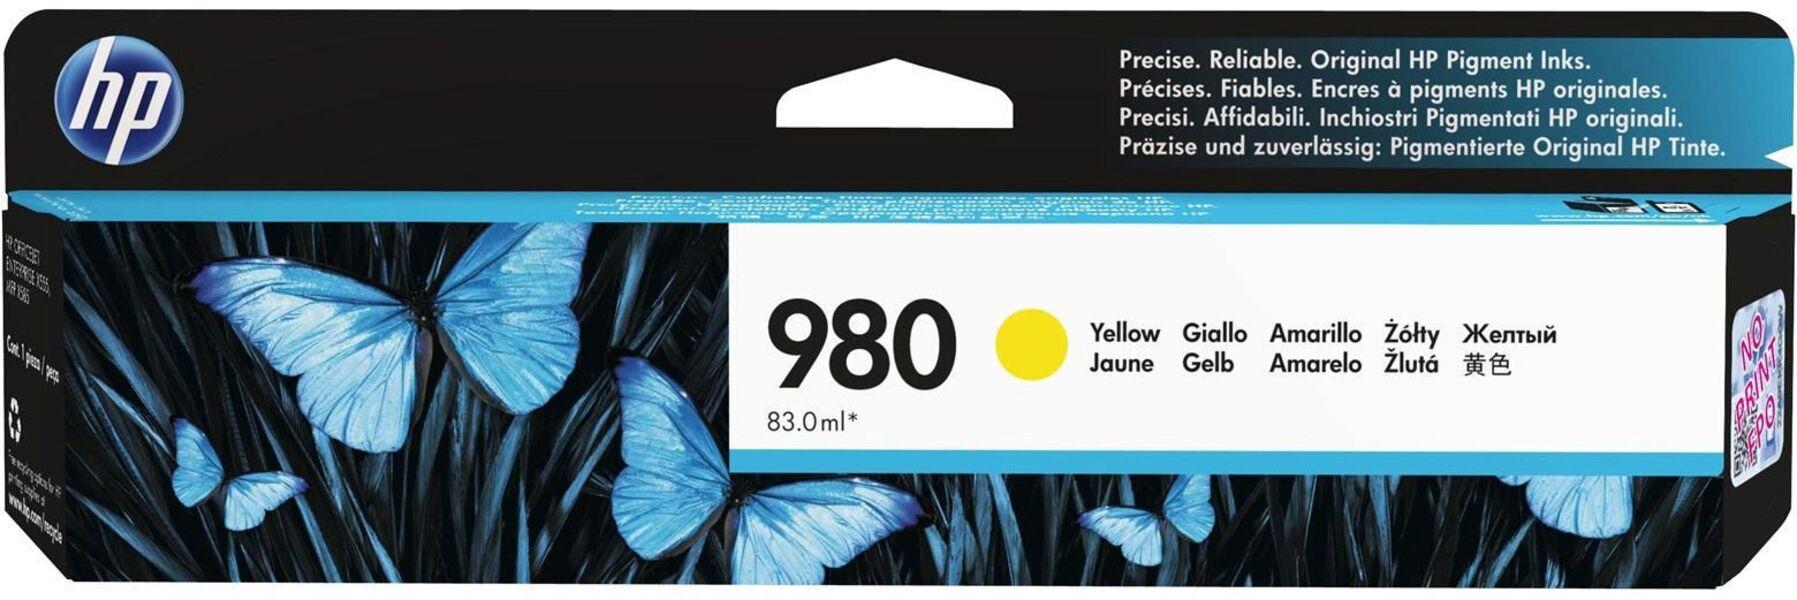 HP Ink/980 Yellow Original Cartridge D8J09A